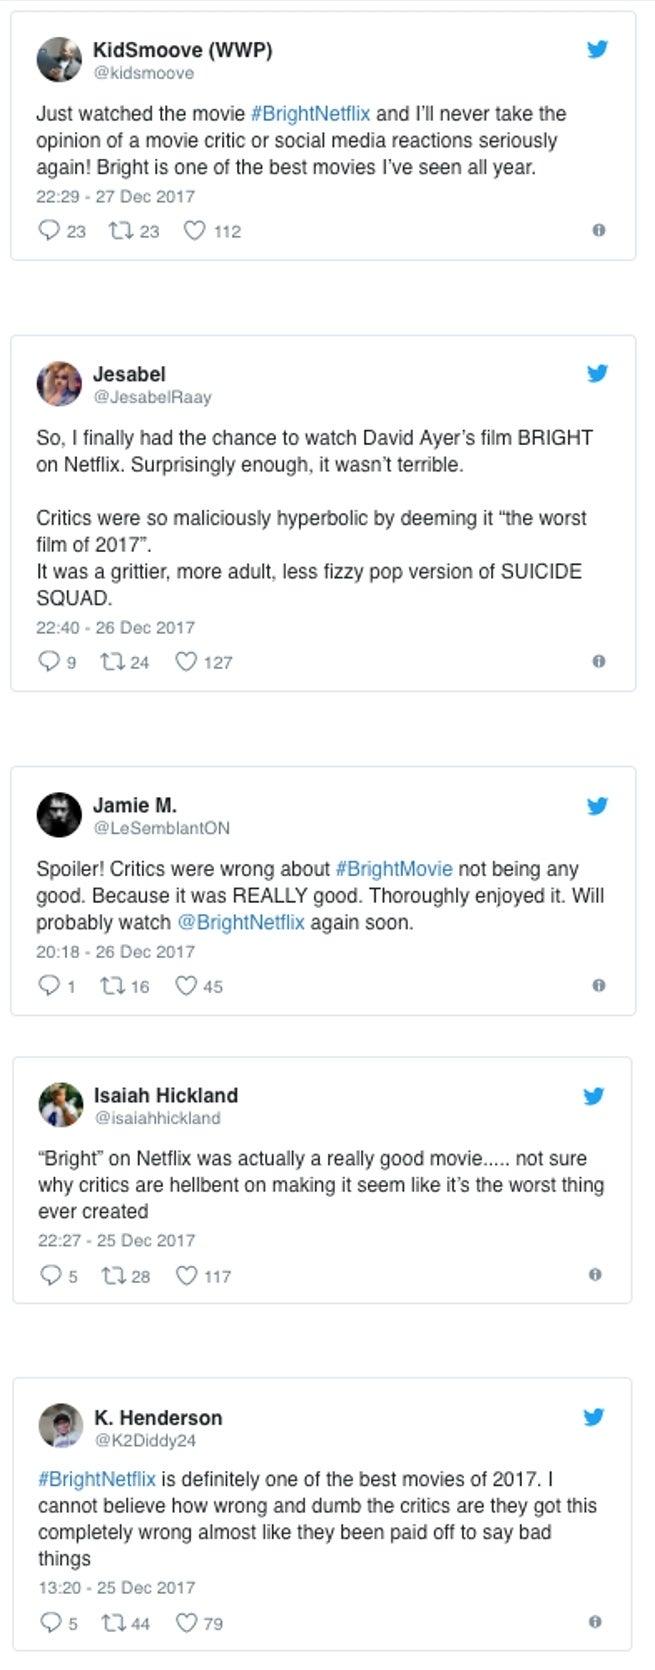 Bright Movie Positive Reviews